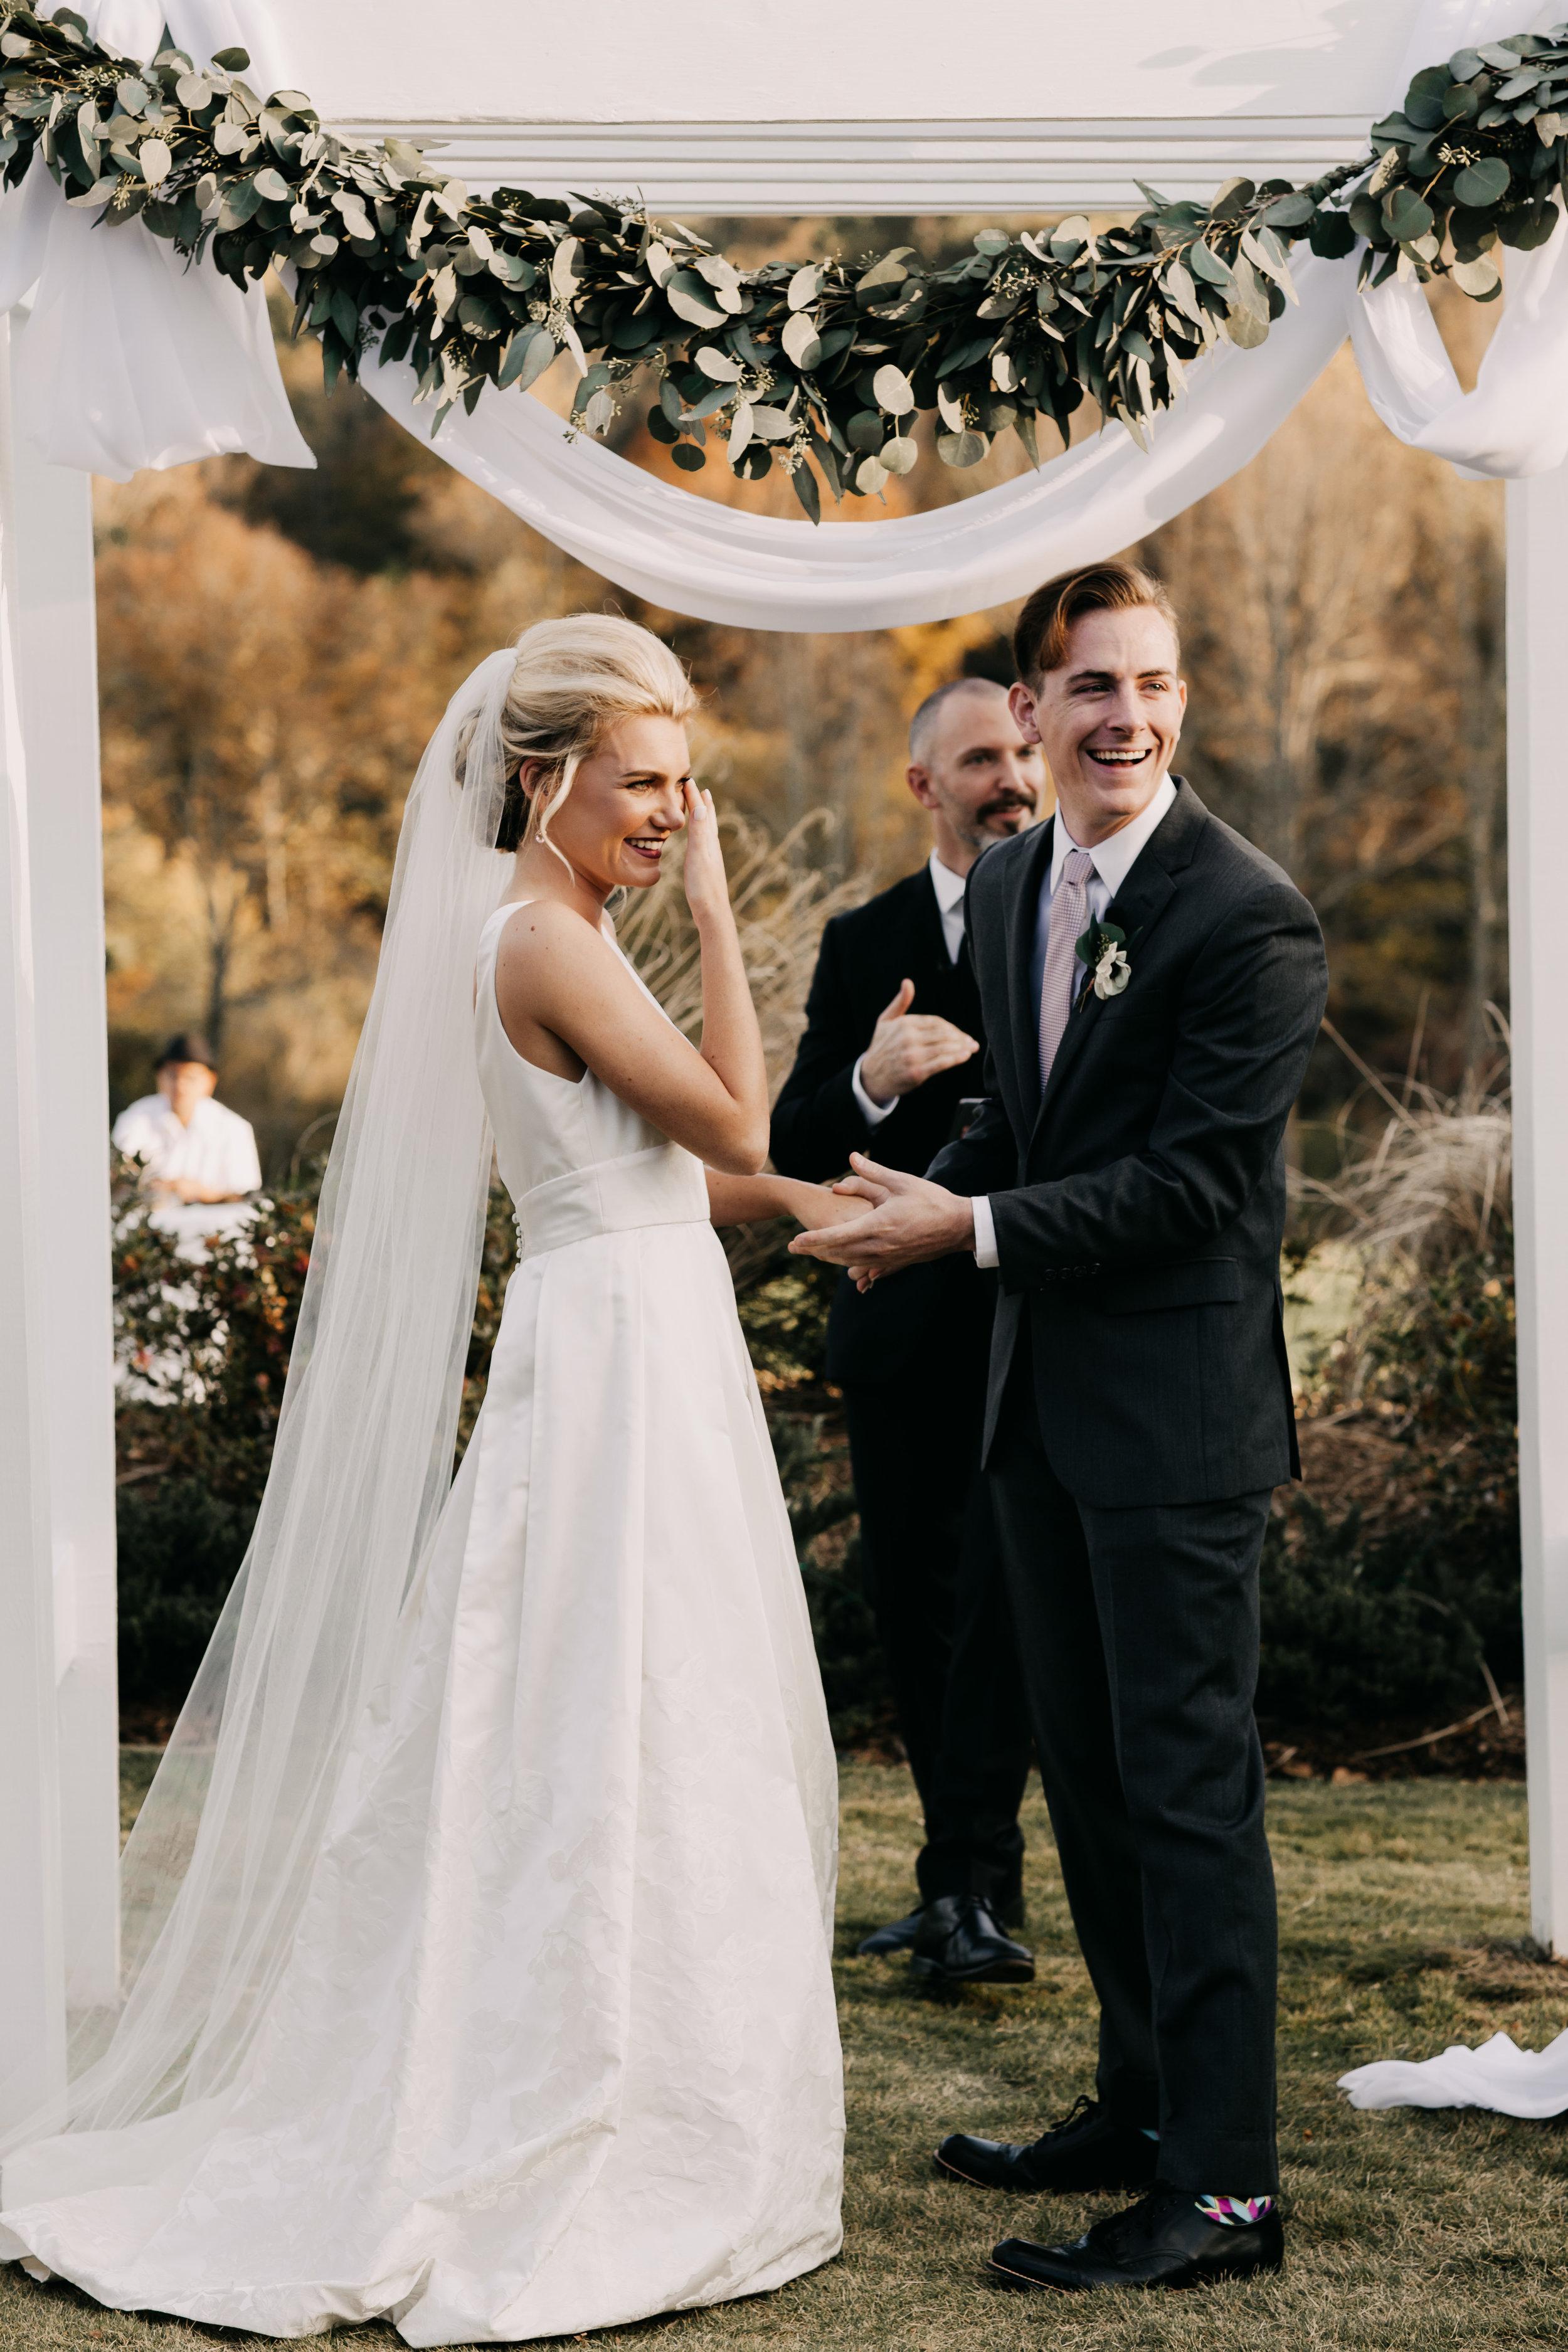 Kaylyn & Ryan Final Wedding Photos336.jpg